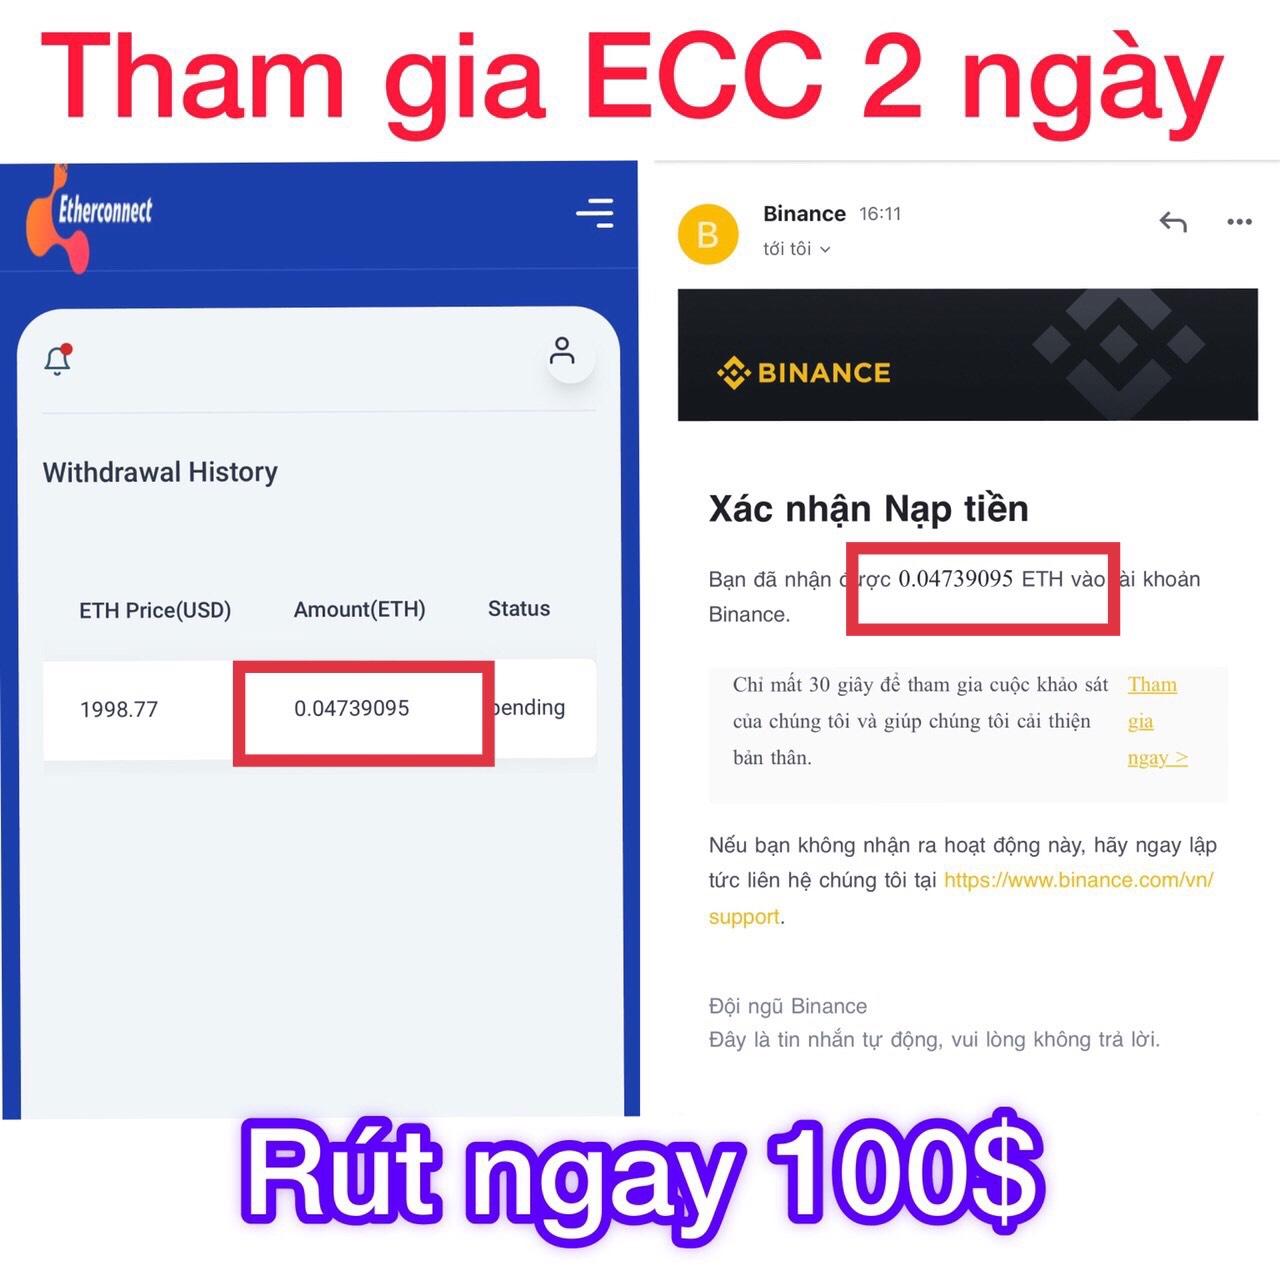 rut tien Etherconnect